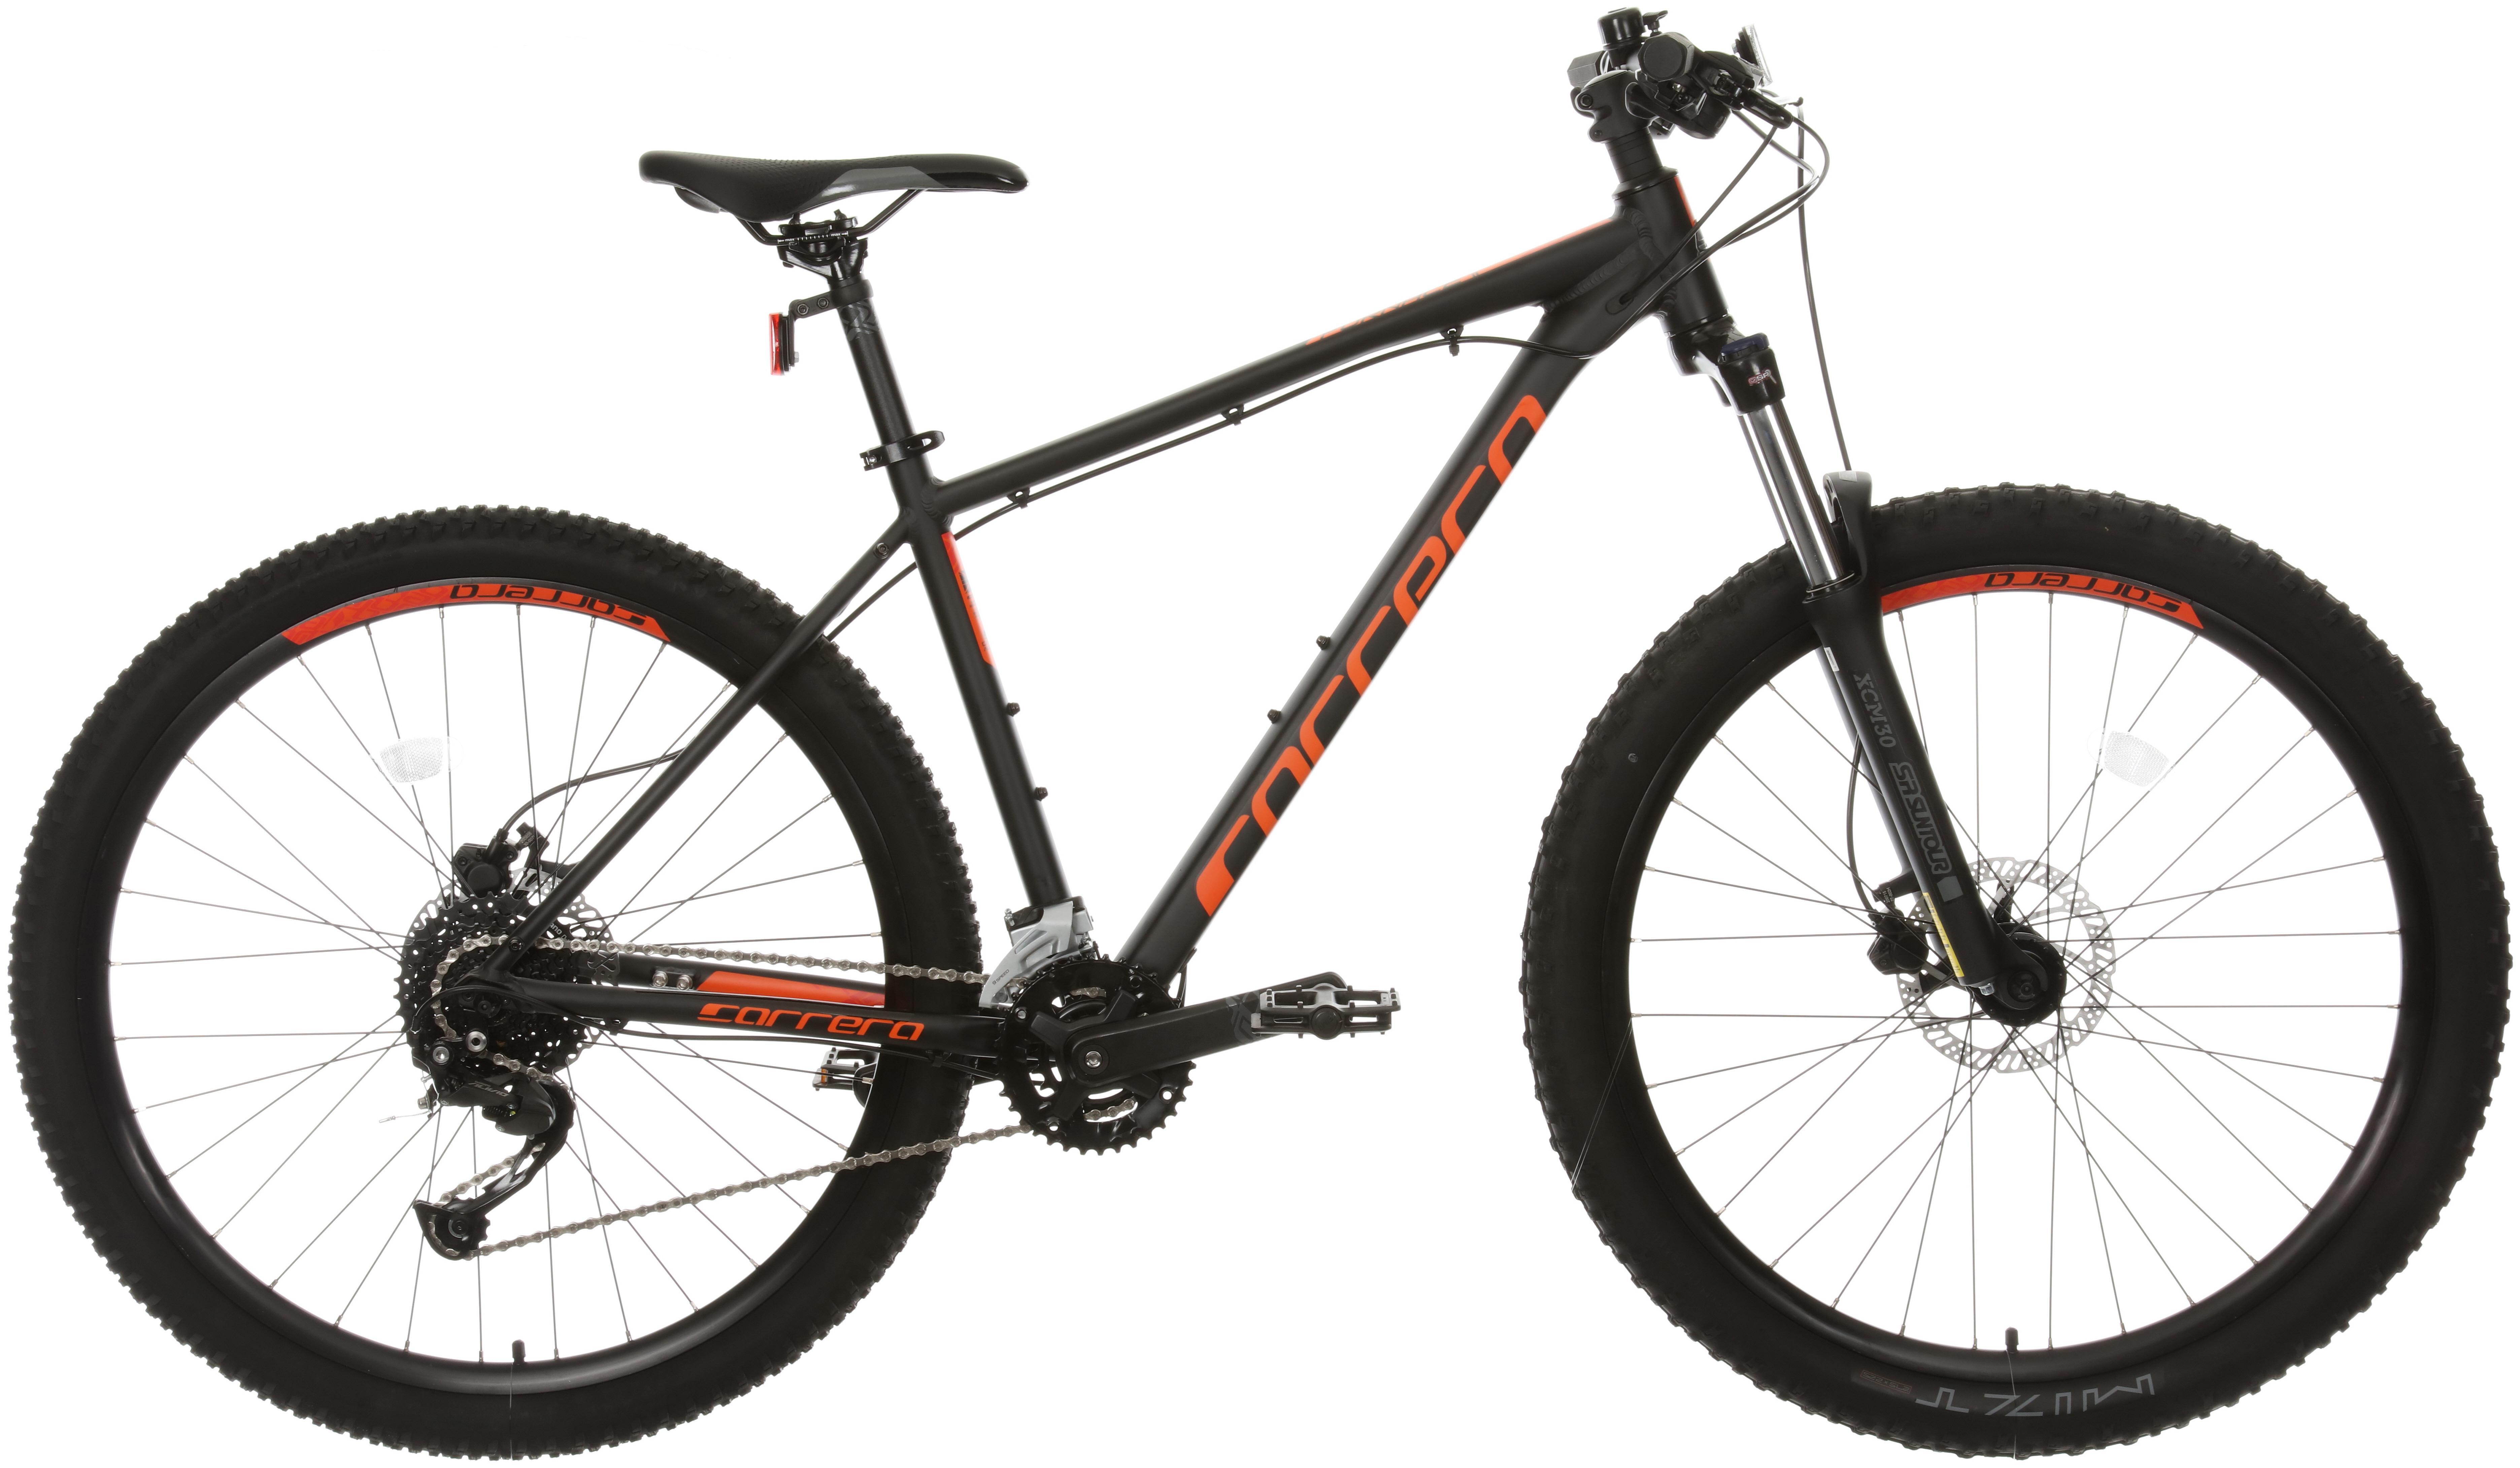 Carrera Furnace 2 Mountain Bike - Black/Orange